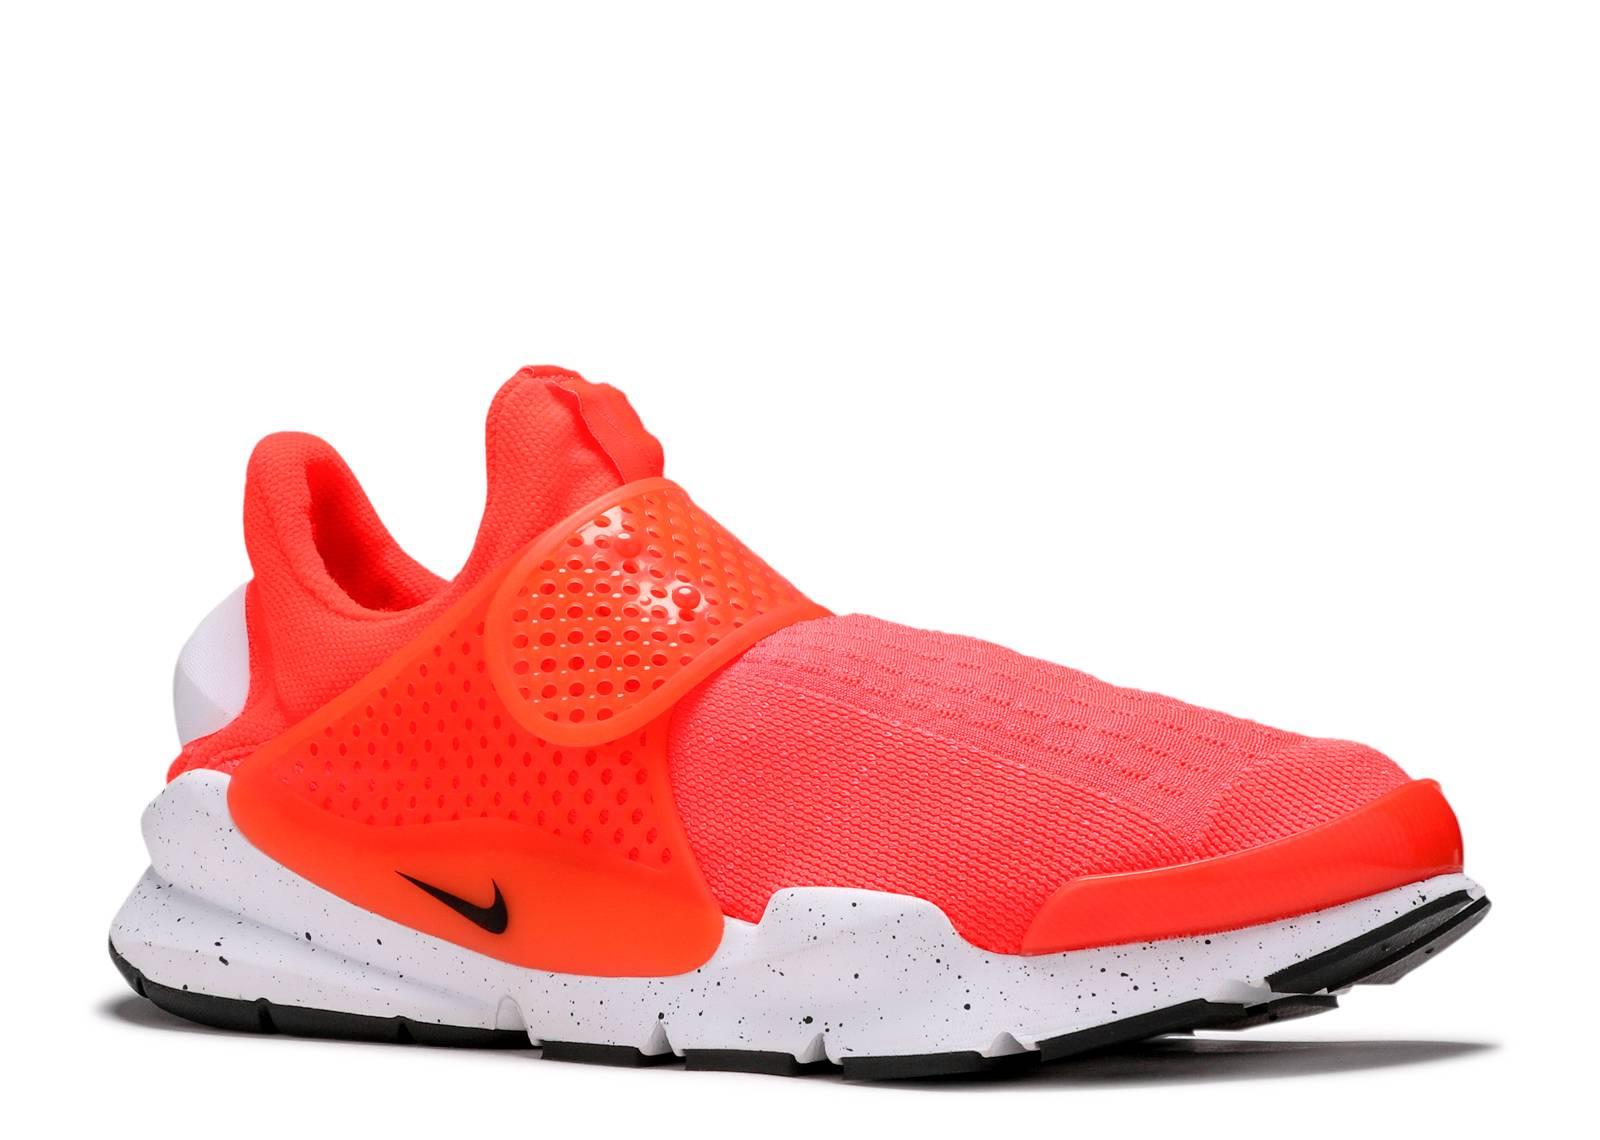 dc29cc60c310 Sock Dart Se - Nike - 833124 800 - total crimson black-white ...